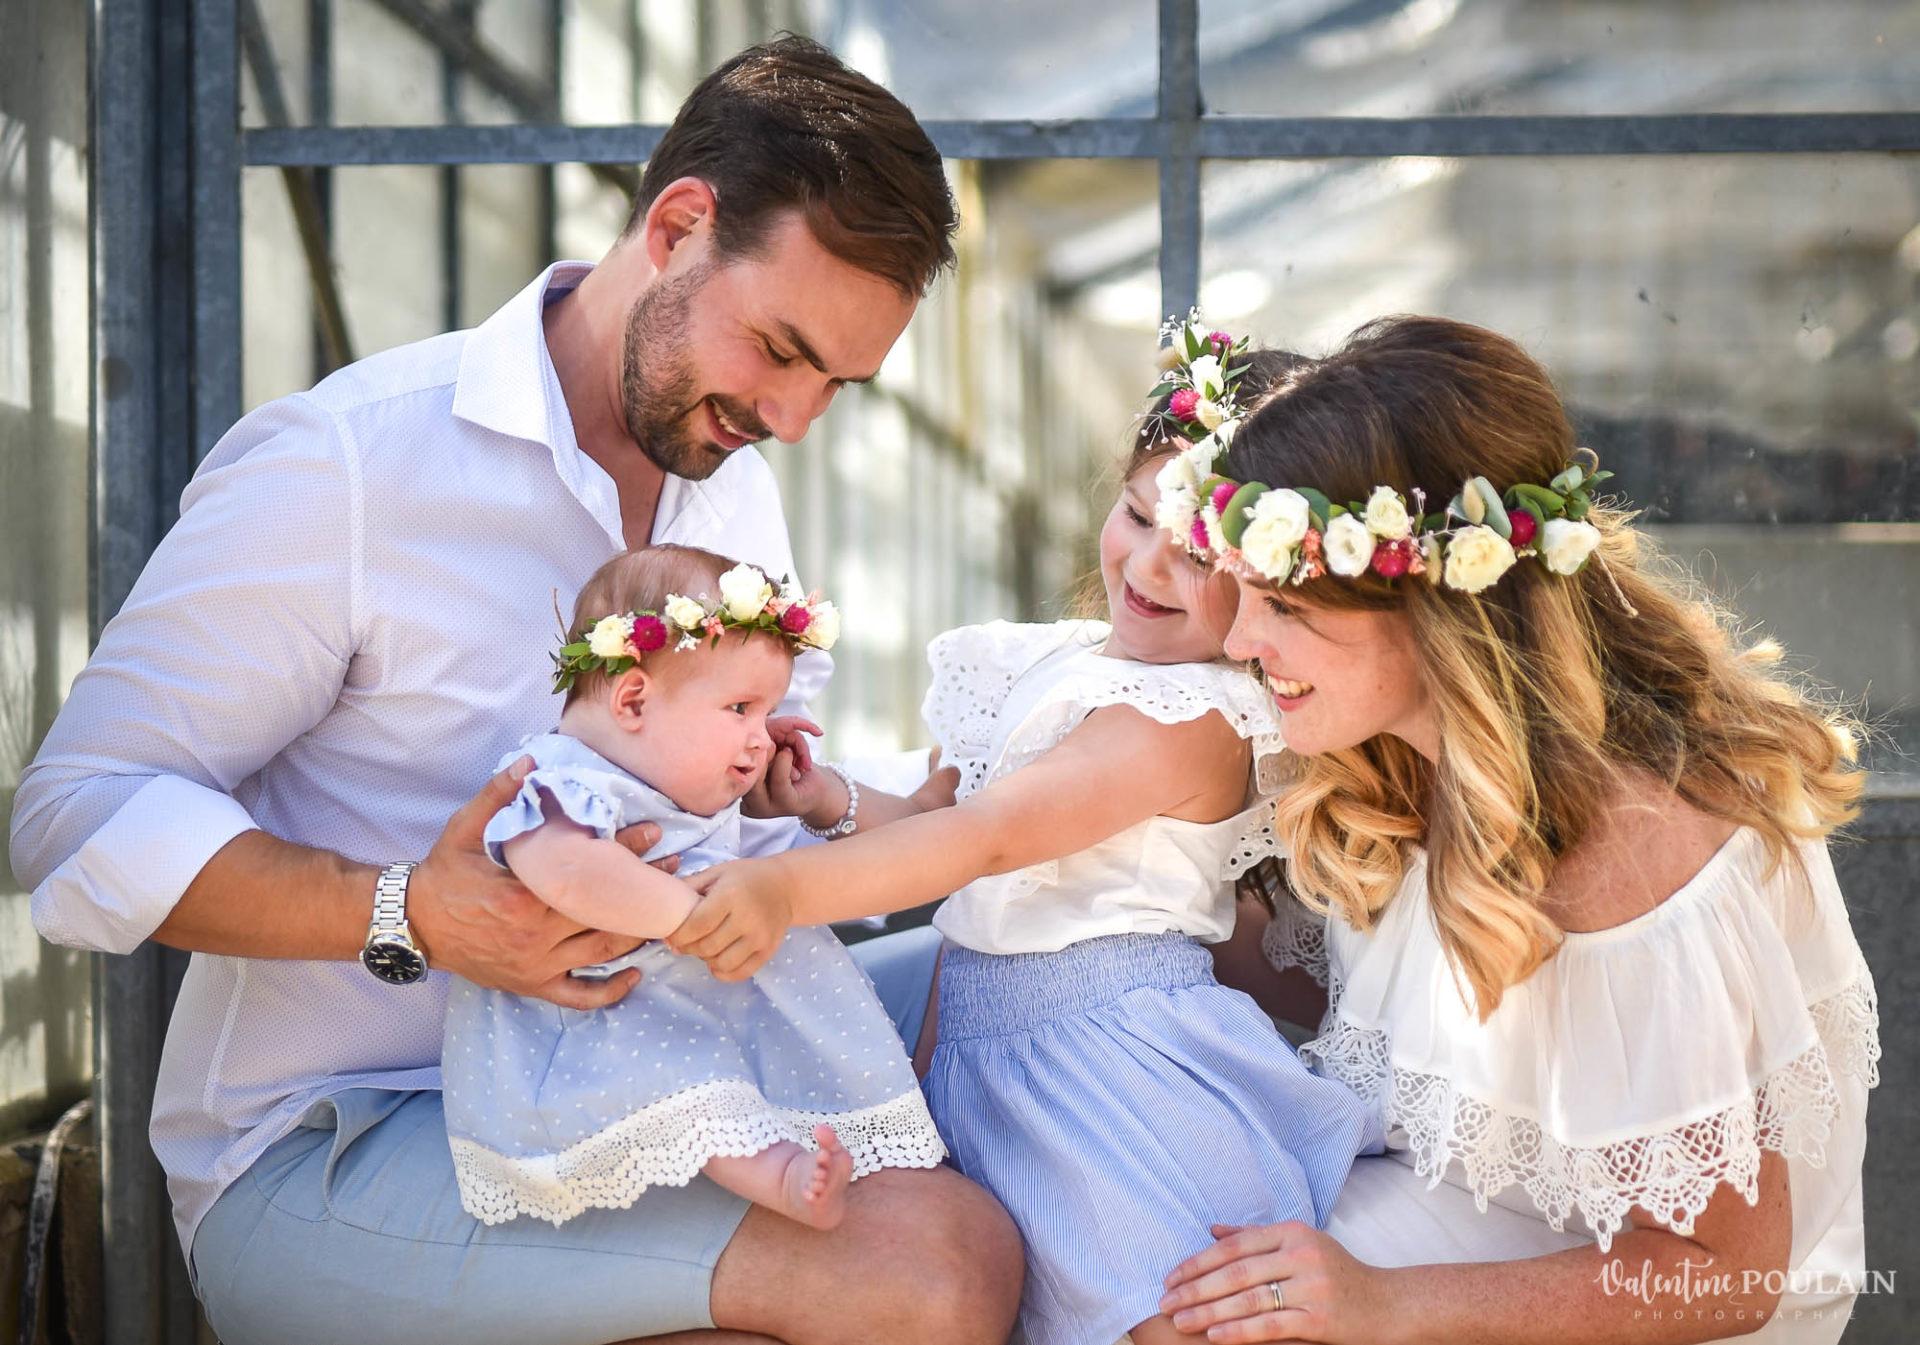 Shooting famille soeurs serre - Valentine Poulain complices